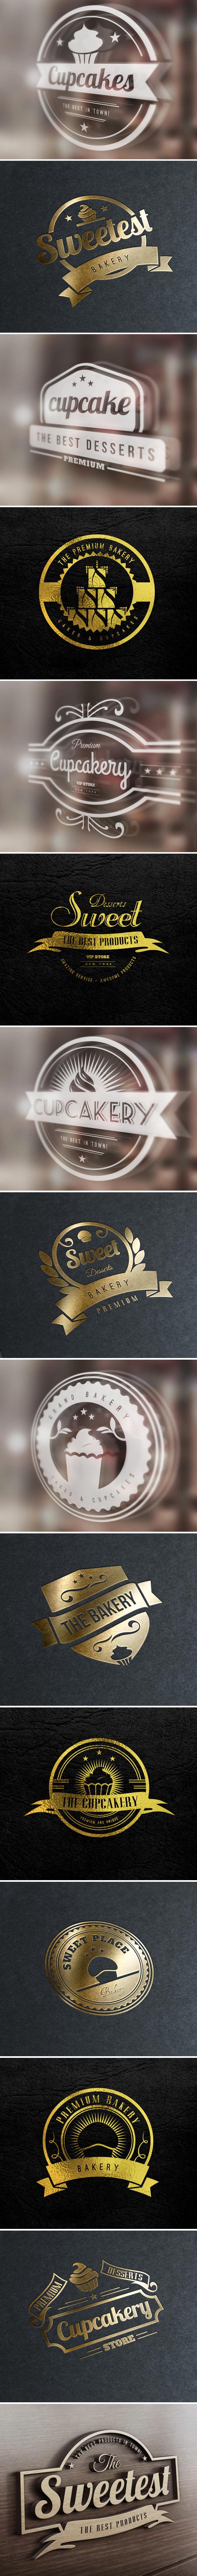 15 Vintage Bakery Logos: Cupcakes & Cakes Logos - c30adc16291015.562a8f514831d 2